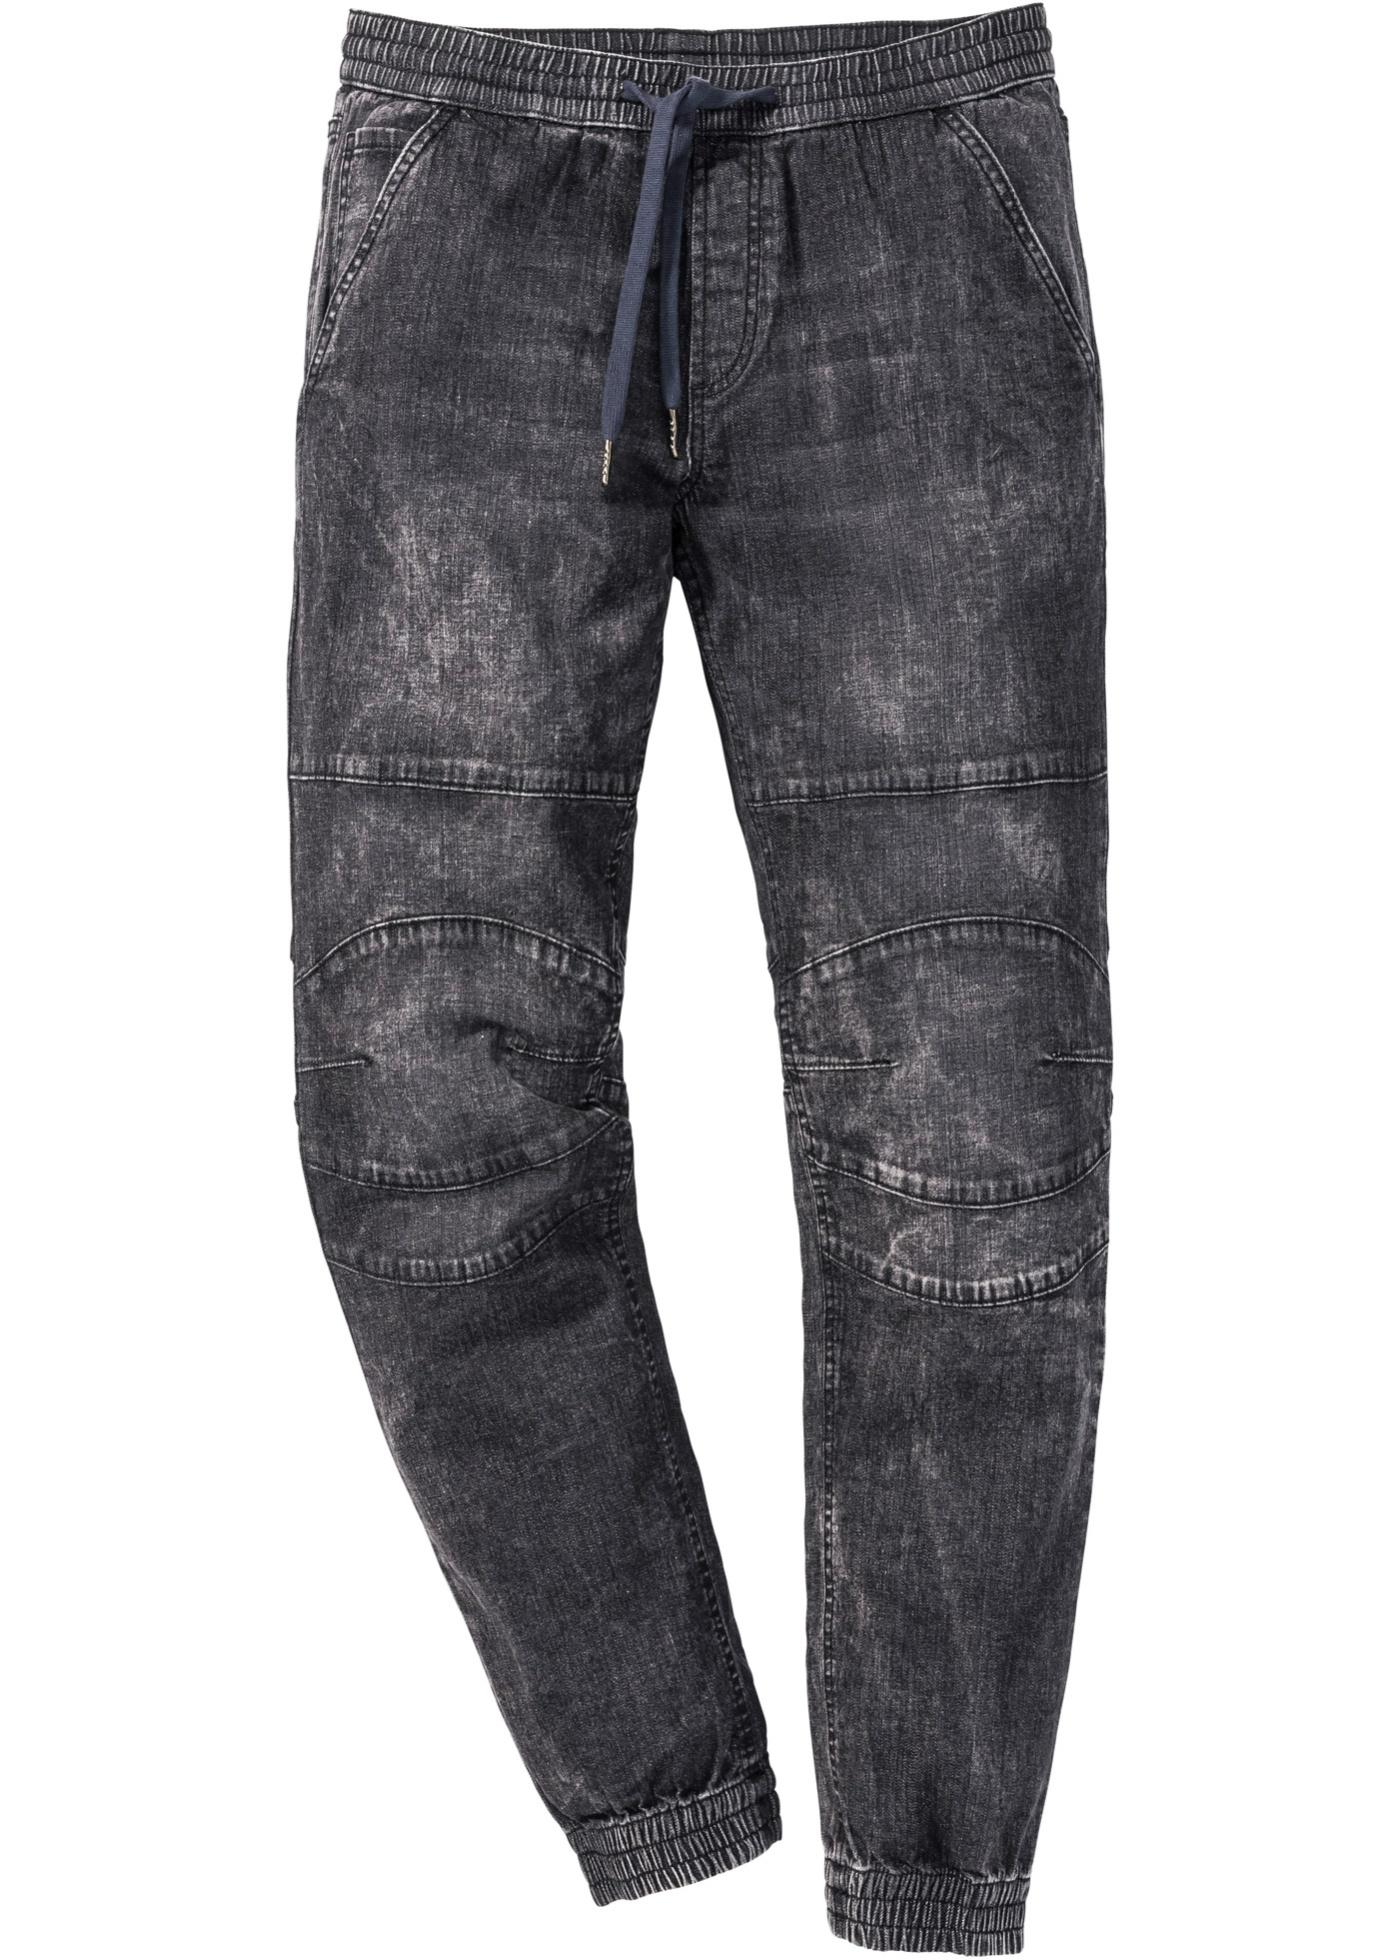 Bonprix - Vida dra-p?? jeans 349.00